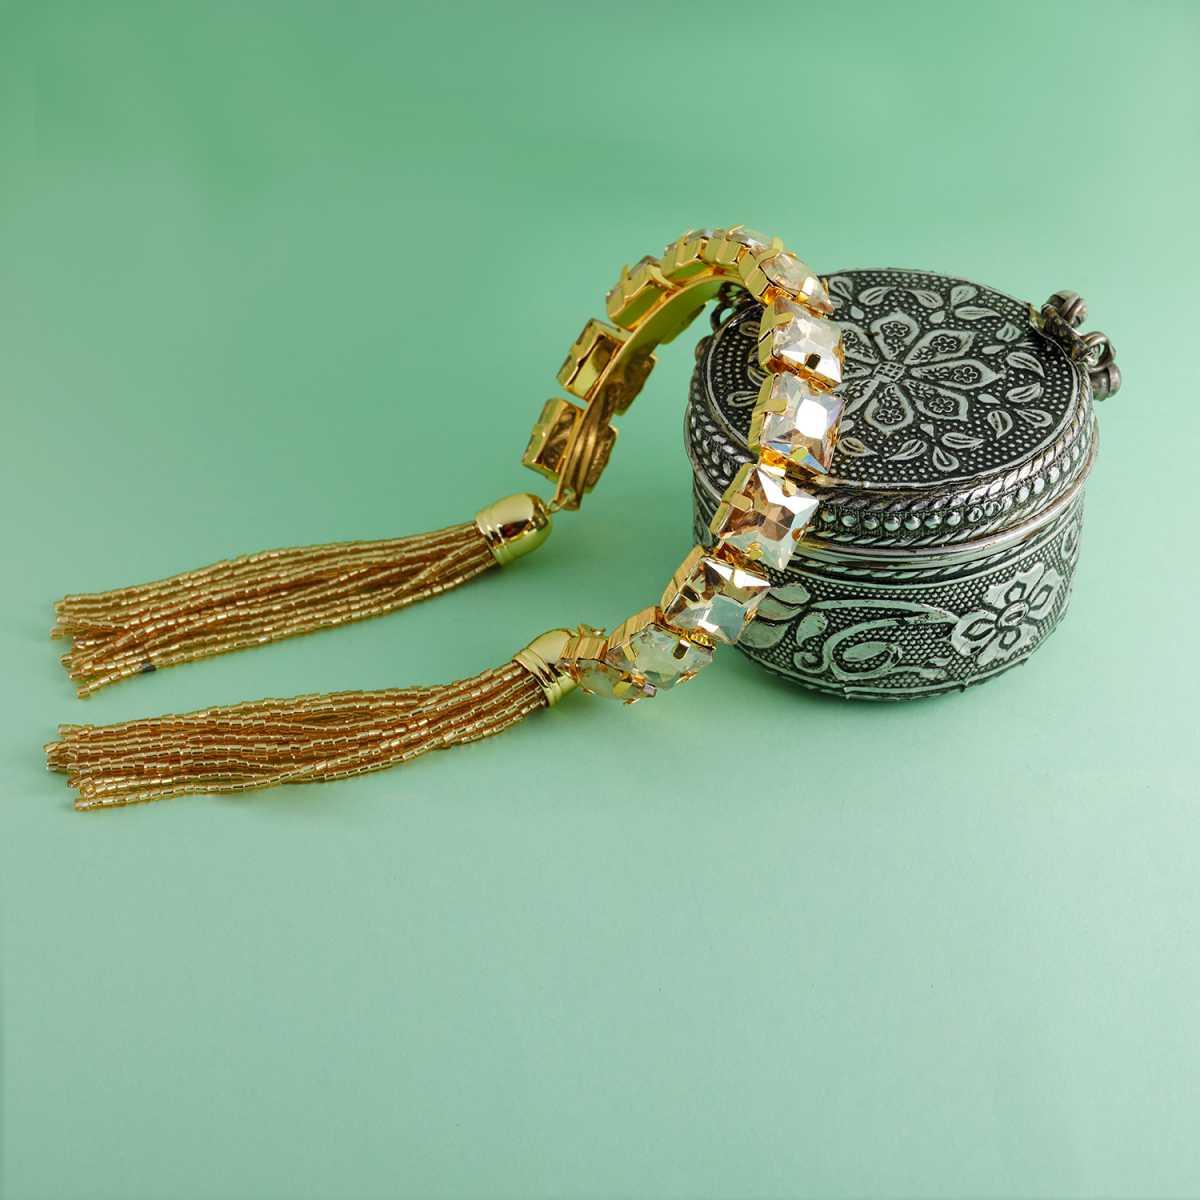 Elegant Gold Colour Stone Harmony Coff And Kada Bracelet For Girls And Women